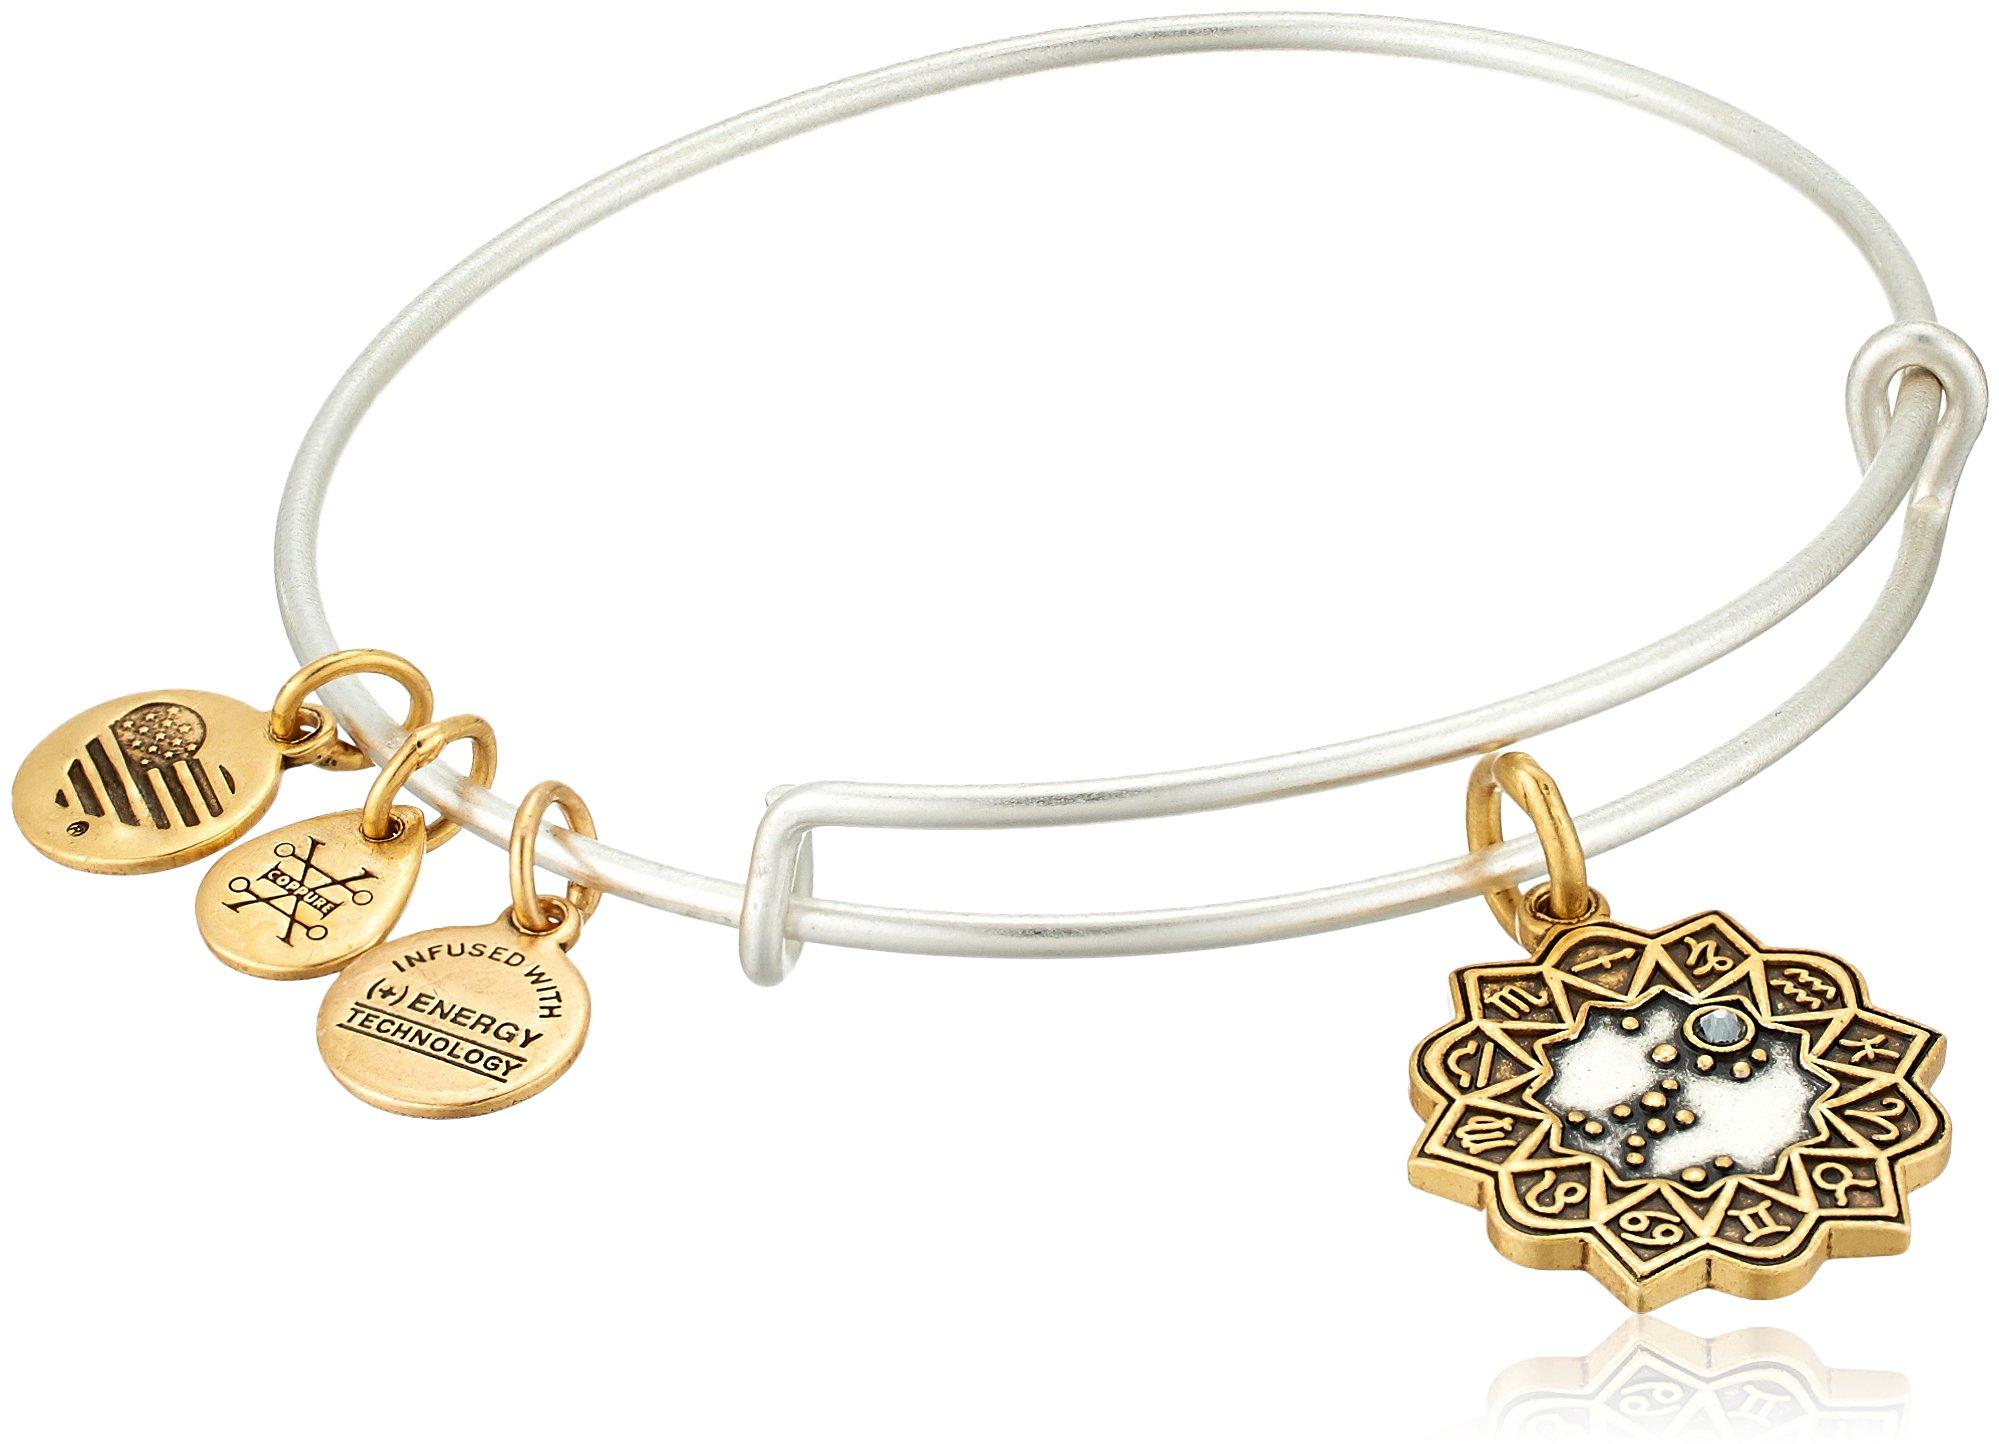 Alex and Ani Women's Sagittarius Two Tone Bangle Bracelet